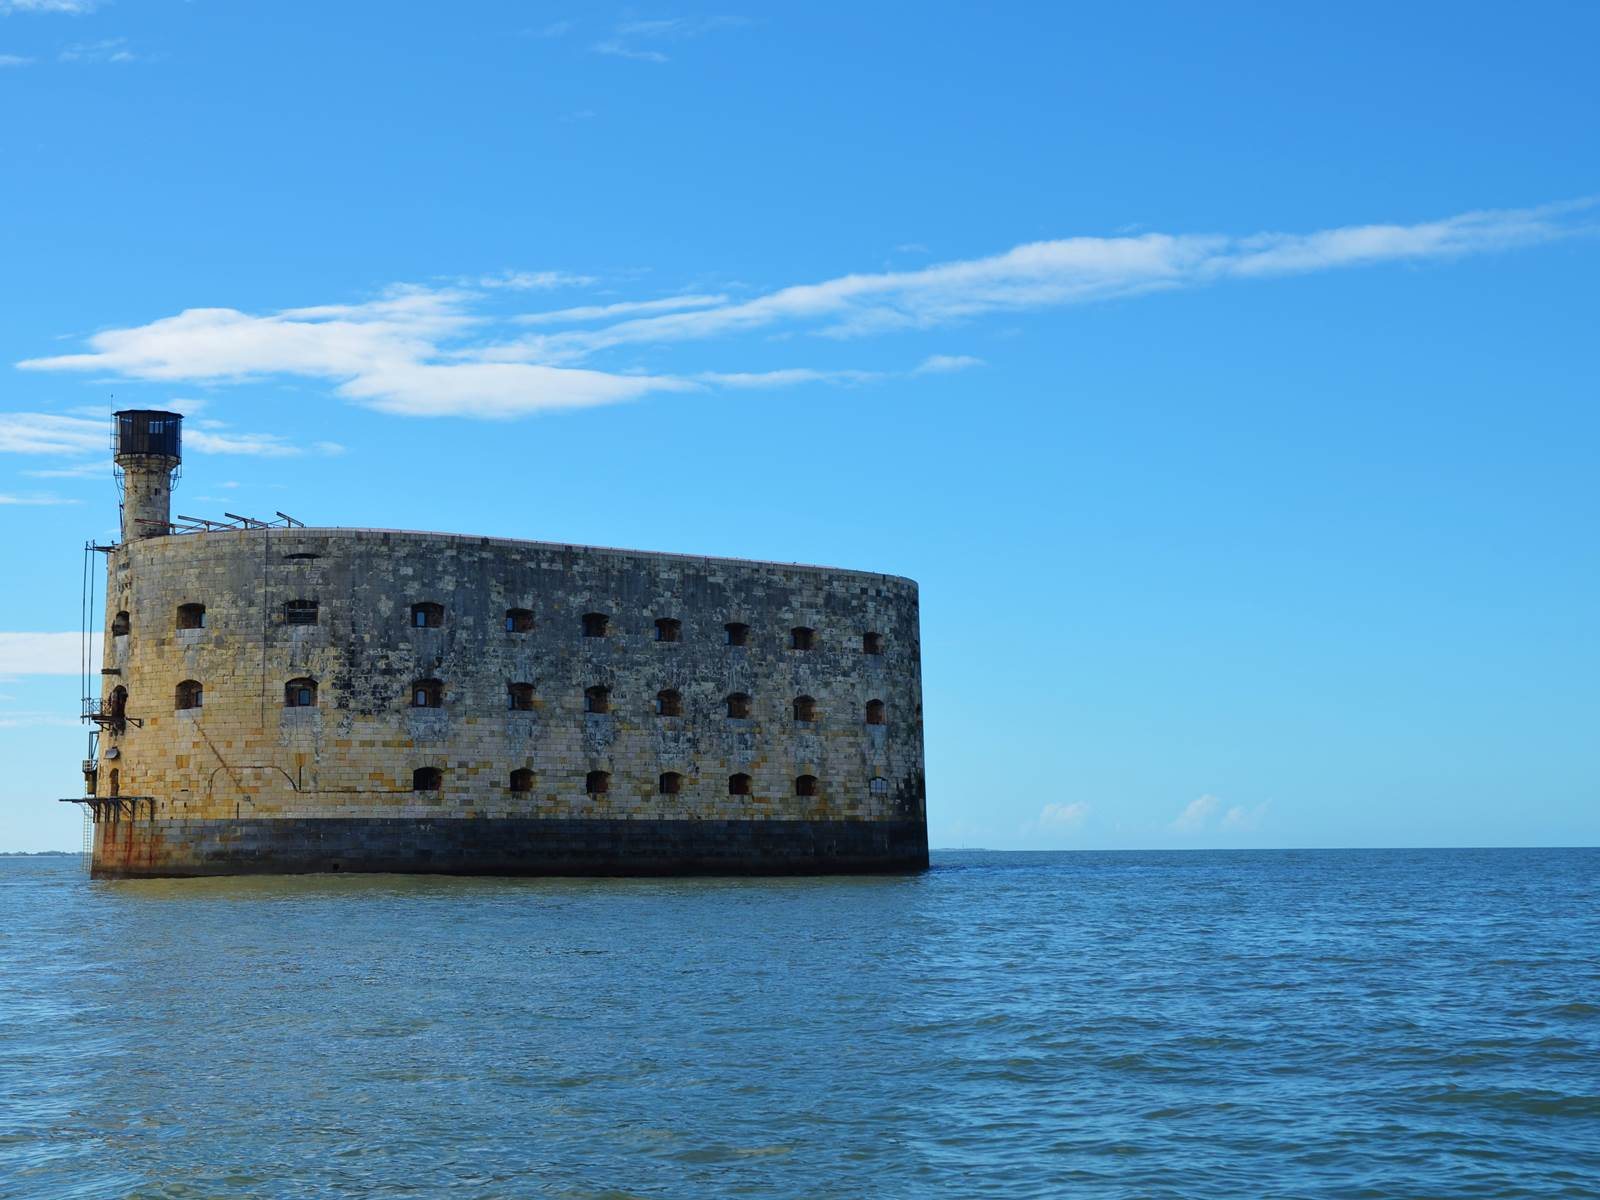 Naviguer à l'approche du Fort Boyard